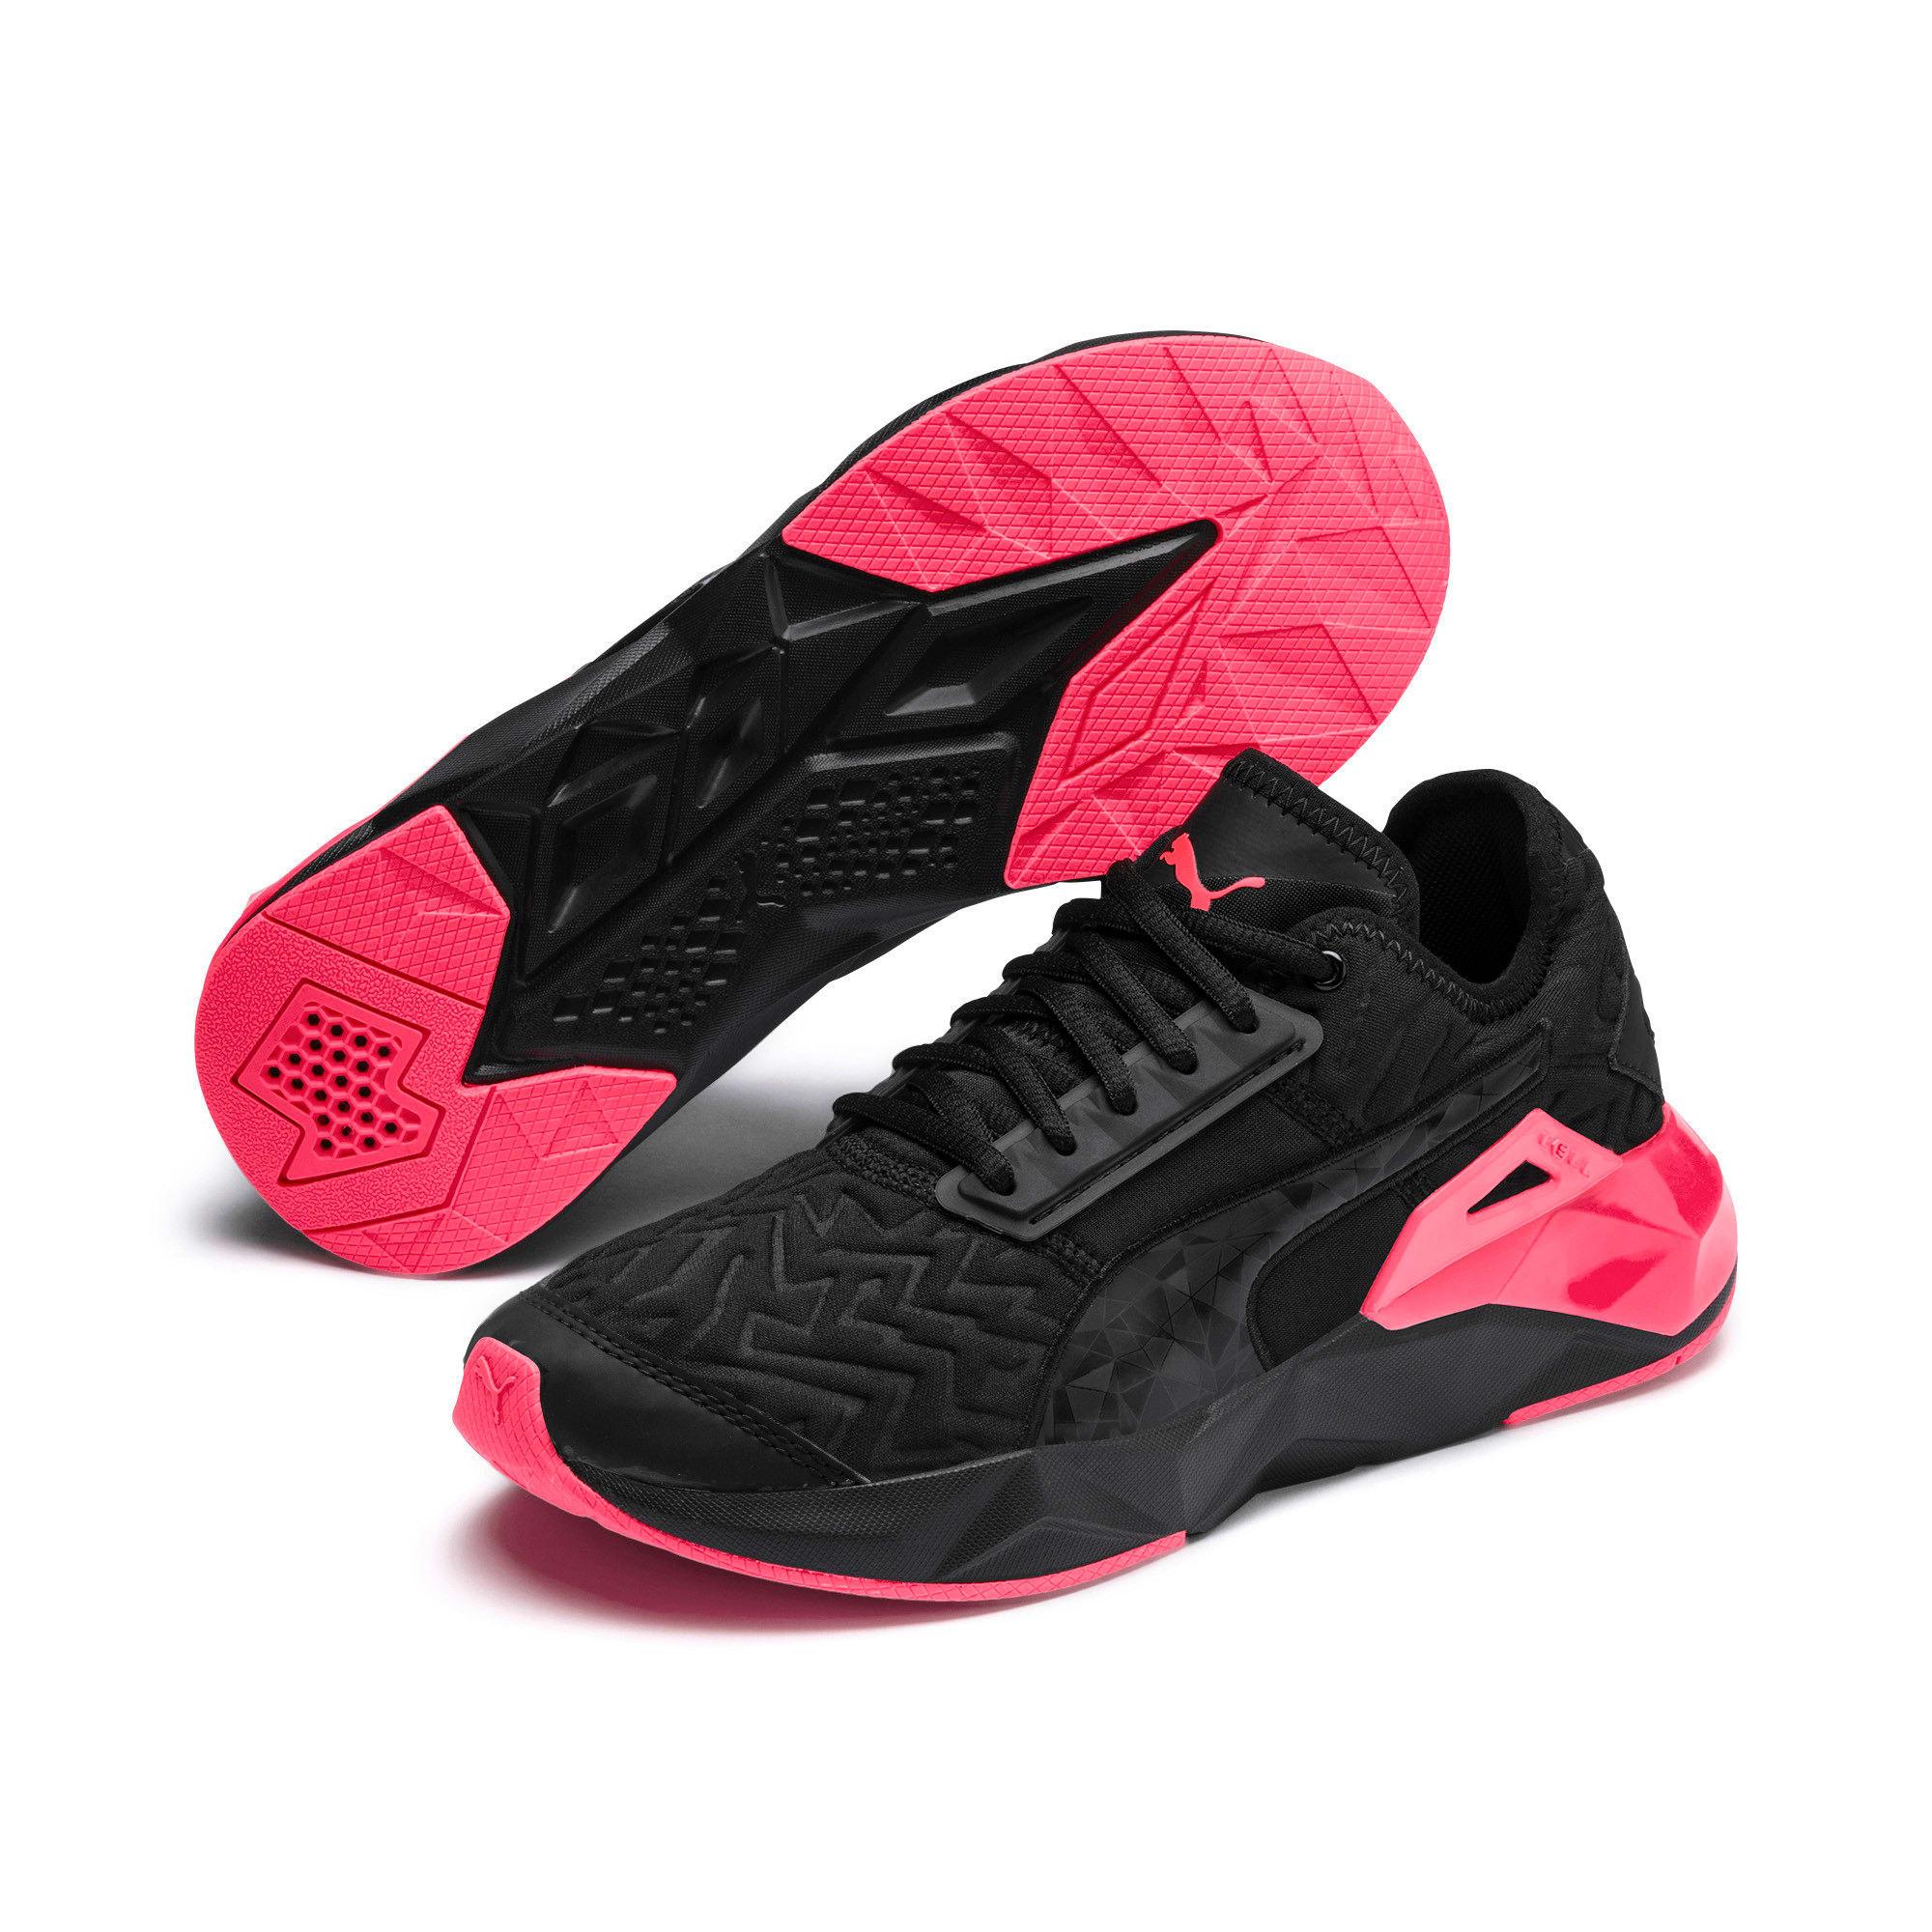 Thumbnail 2 of CELL Plasmic Fluorescent Women's Training Shoes, Puma Black-Pink Alert, medium